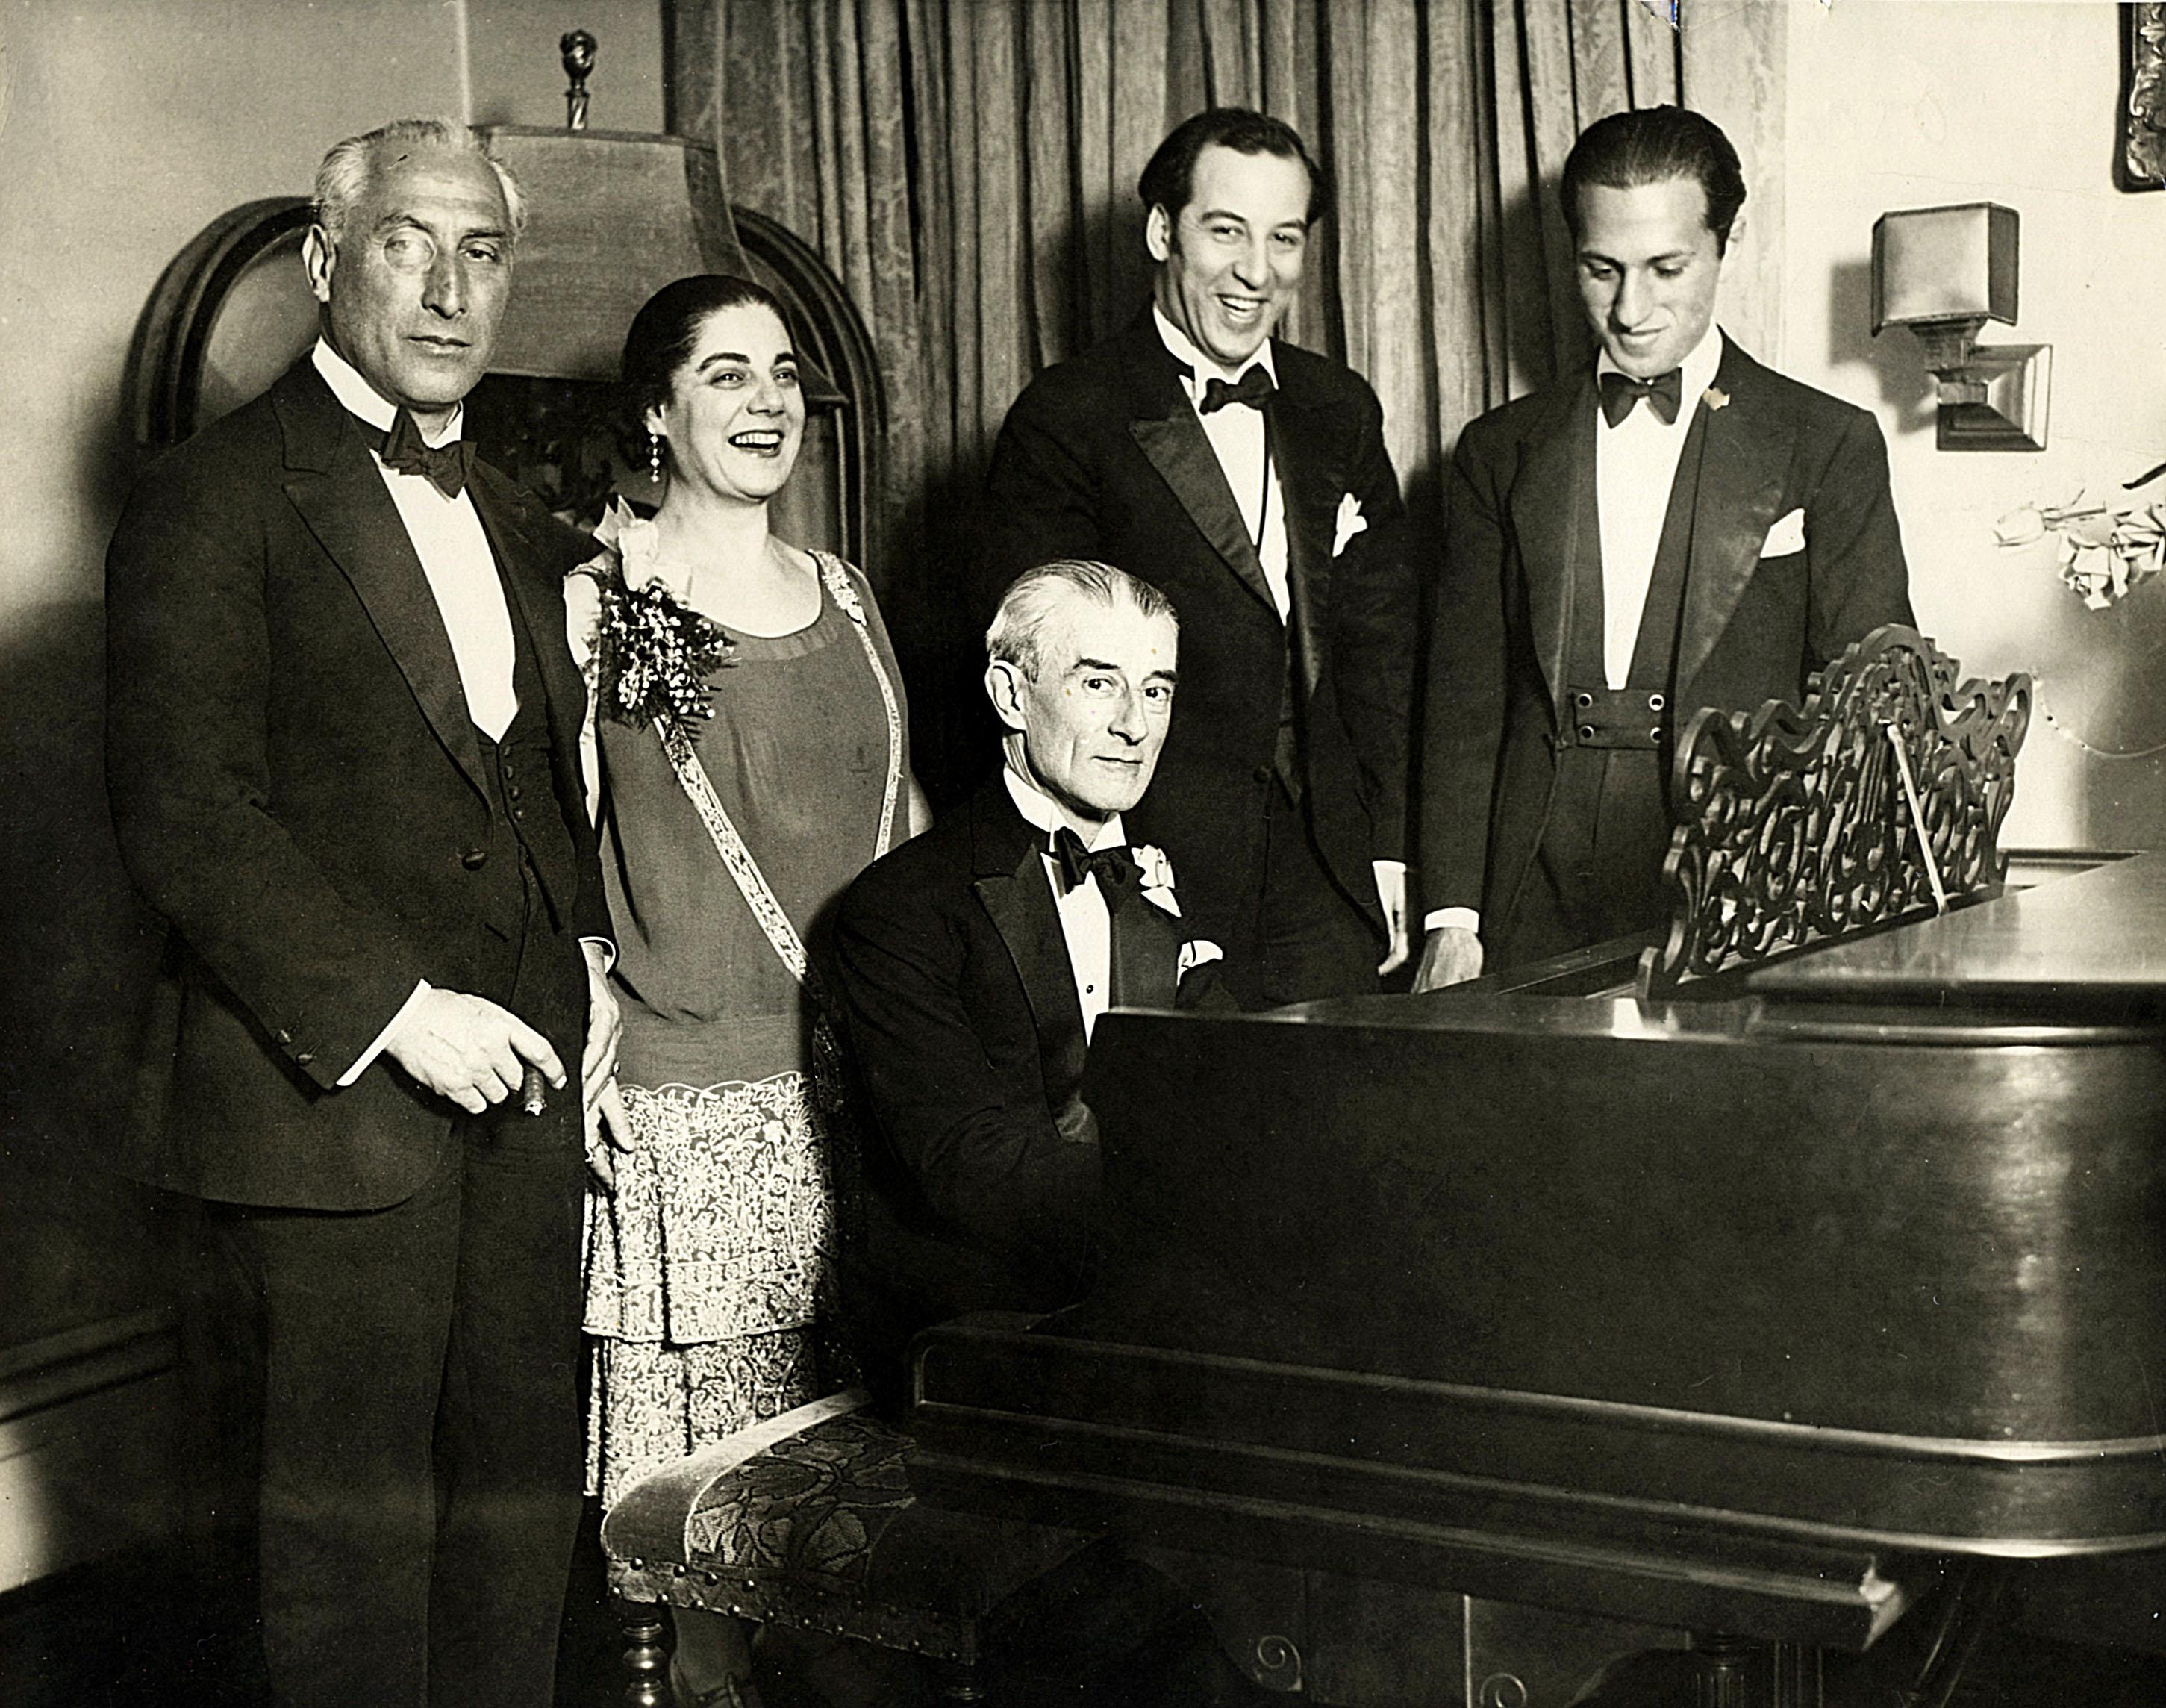 Fichier:Ravel Gershwin Leide-Tedesco002.jpg — Wikipédia